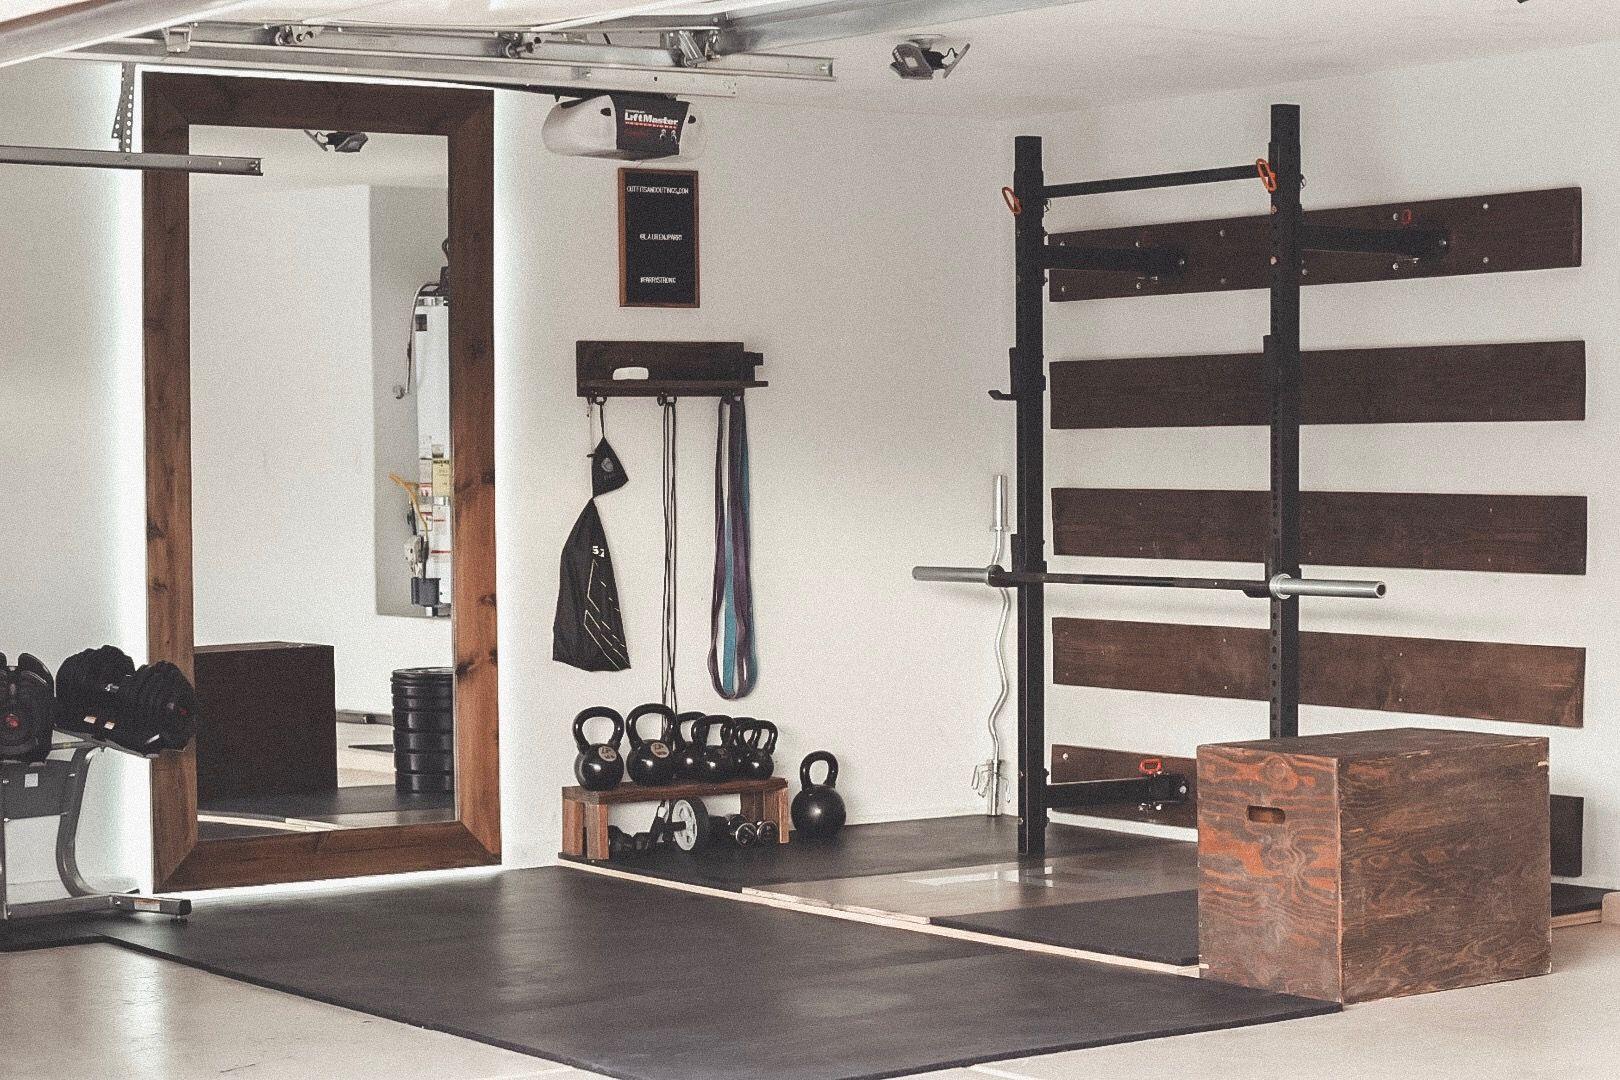 Garage Gym Ideas For Your Home Gym Outfits Outings Gym Room At Home Diy Home Gym Home Gym Decor